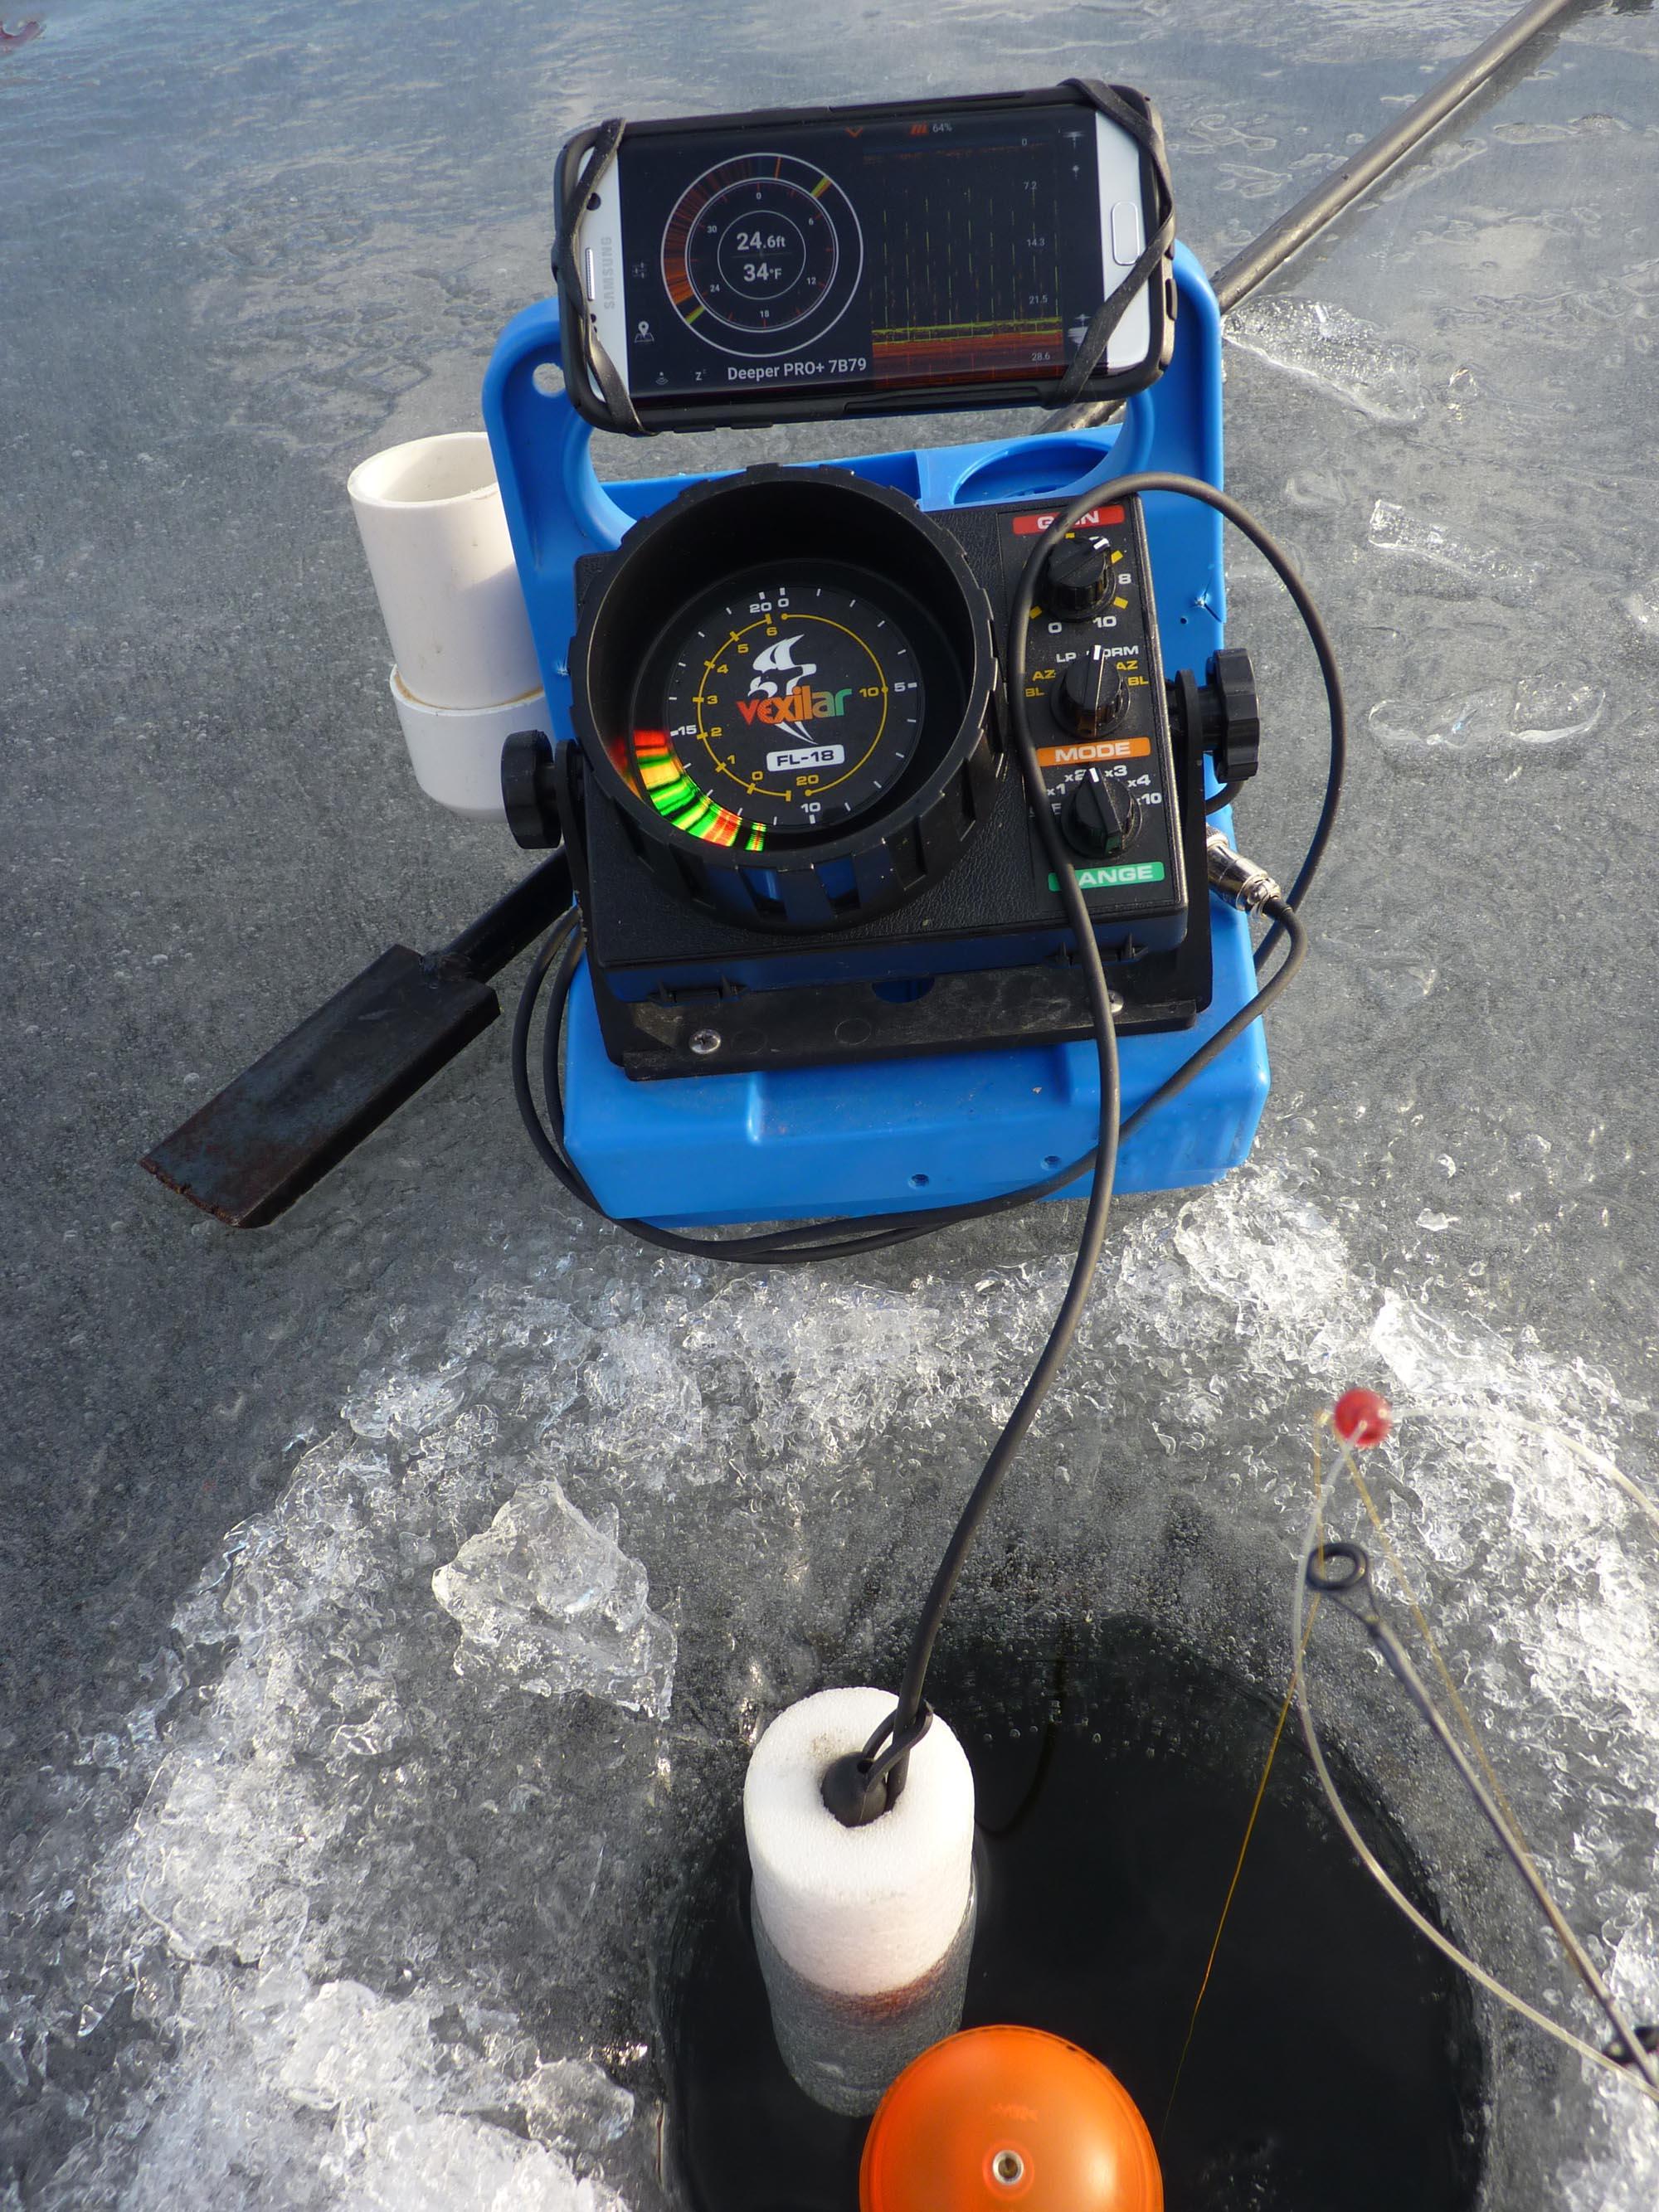 Deeper smart sonar for Deeper fish finder pro